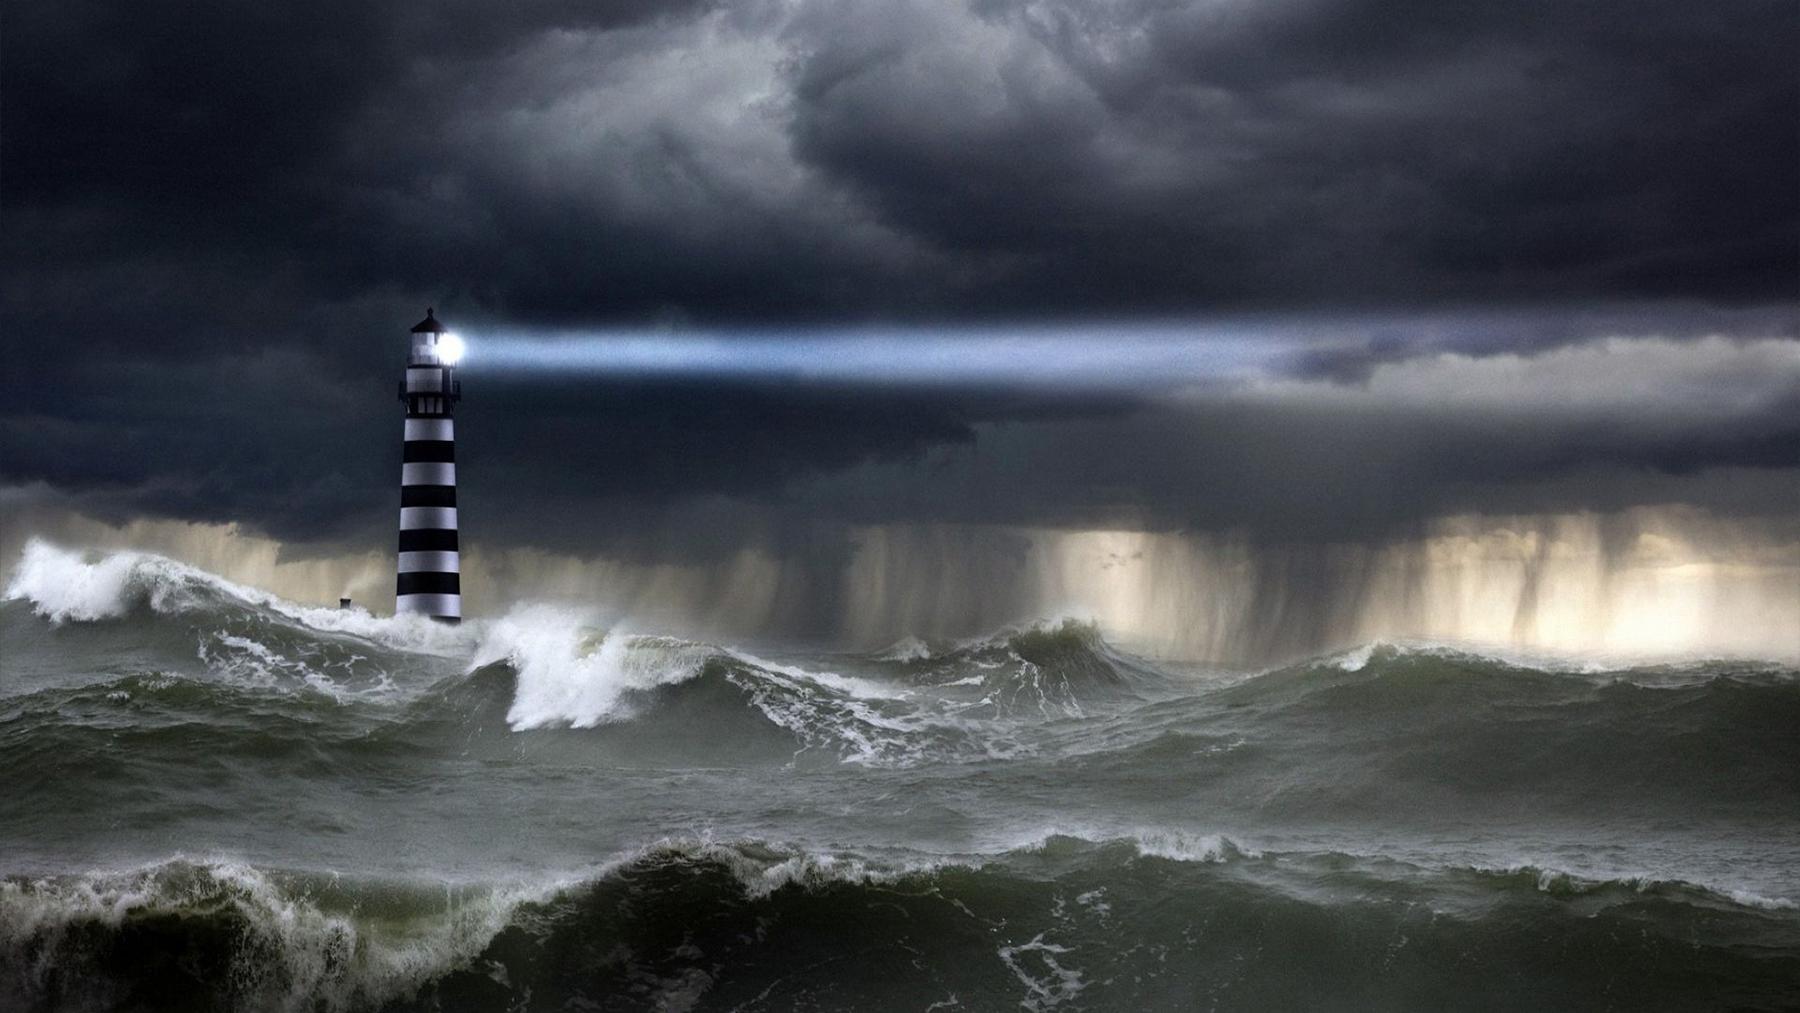 A Light in the Storm: The Ezekiel Stephan Story pt.3